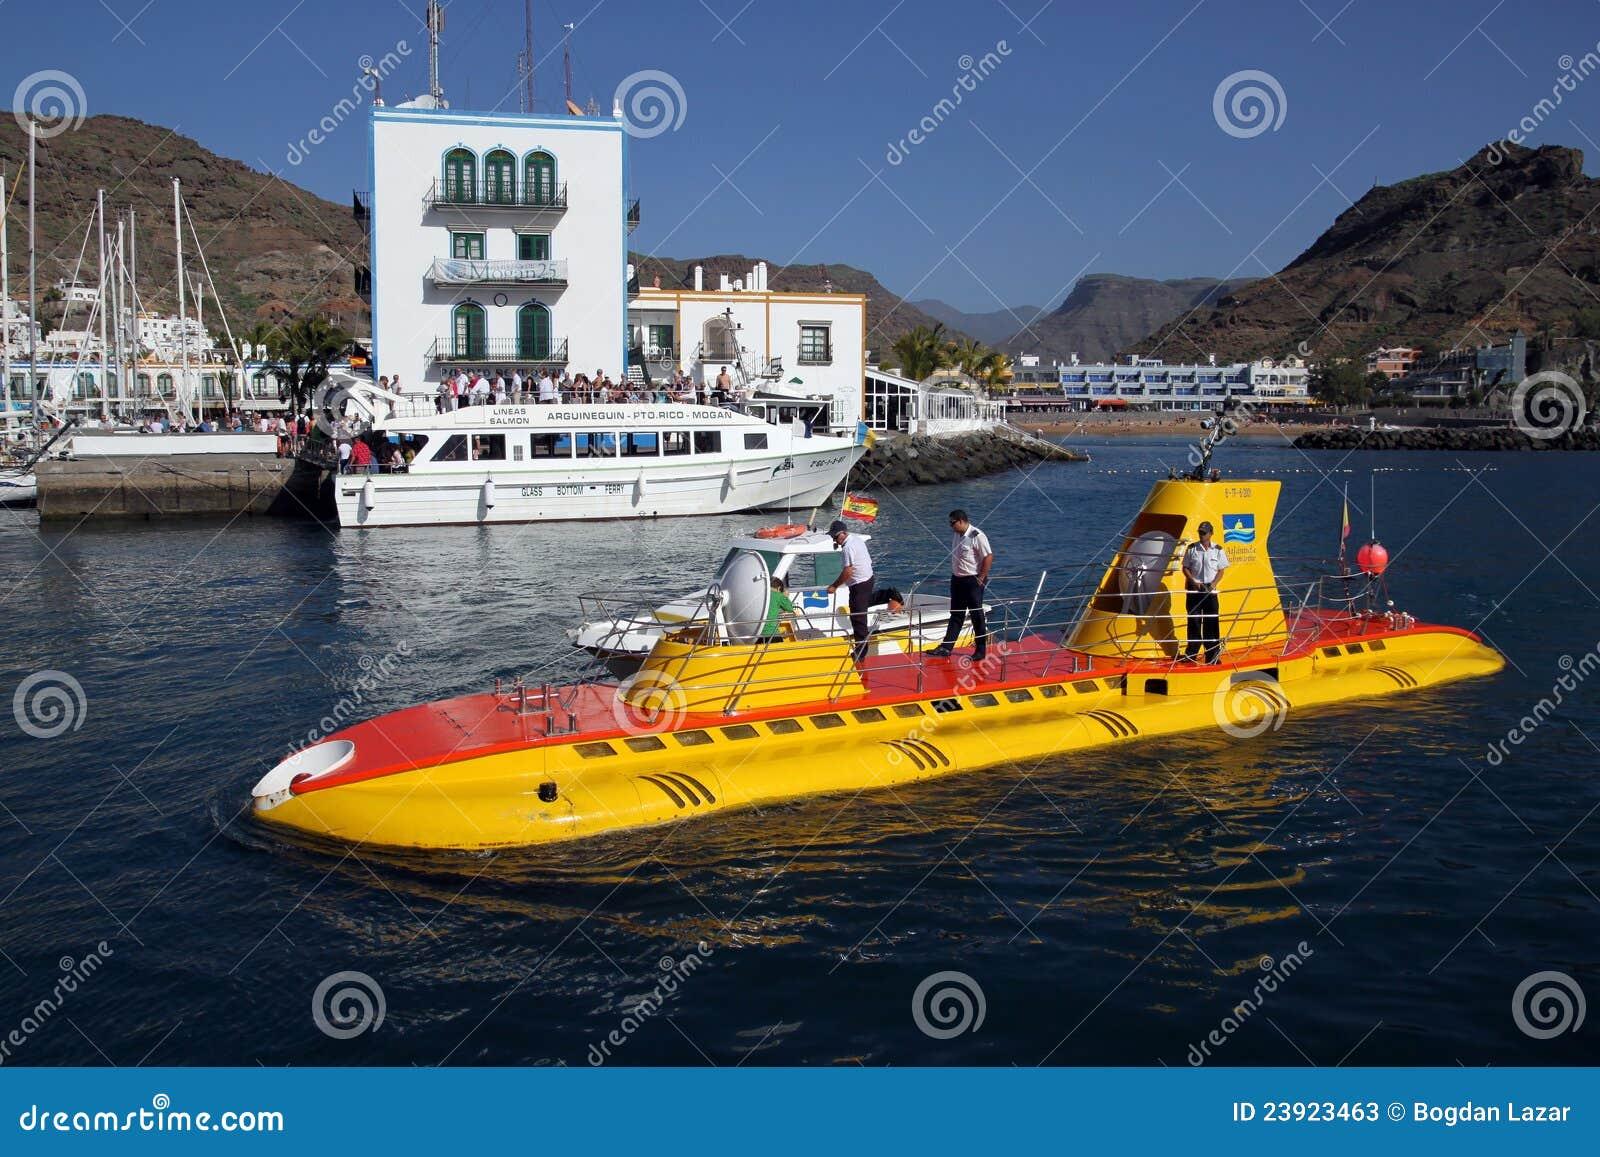 Sommergibile in puerto de mogan gran canaria spagna fotografia stock editoriale immagine - Puerto mogan gran canaria ...